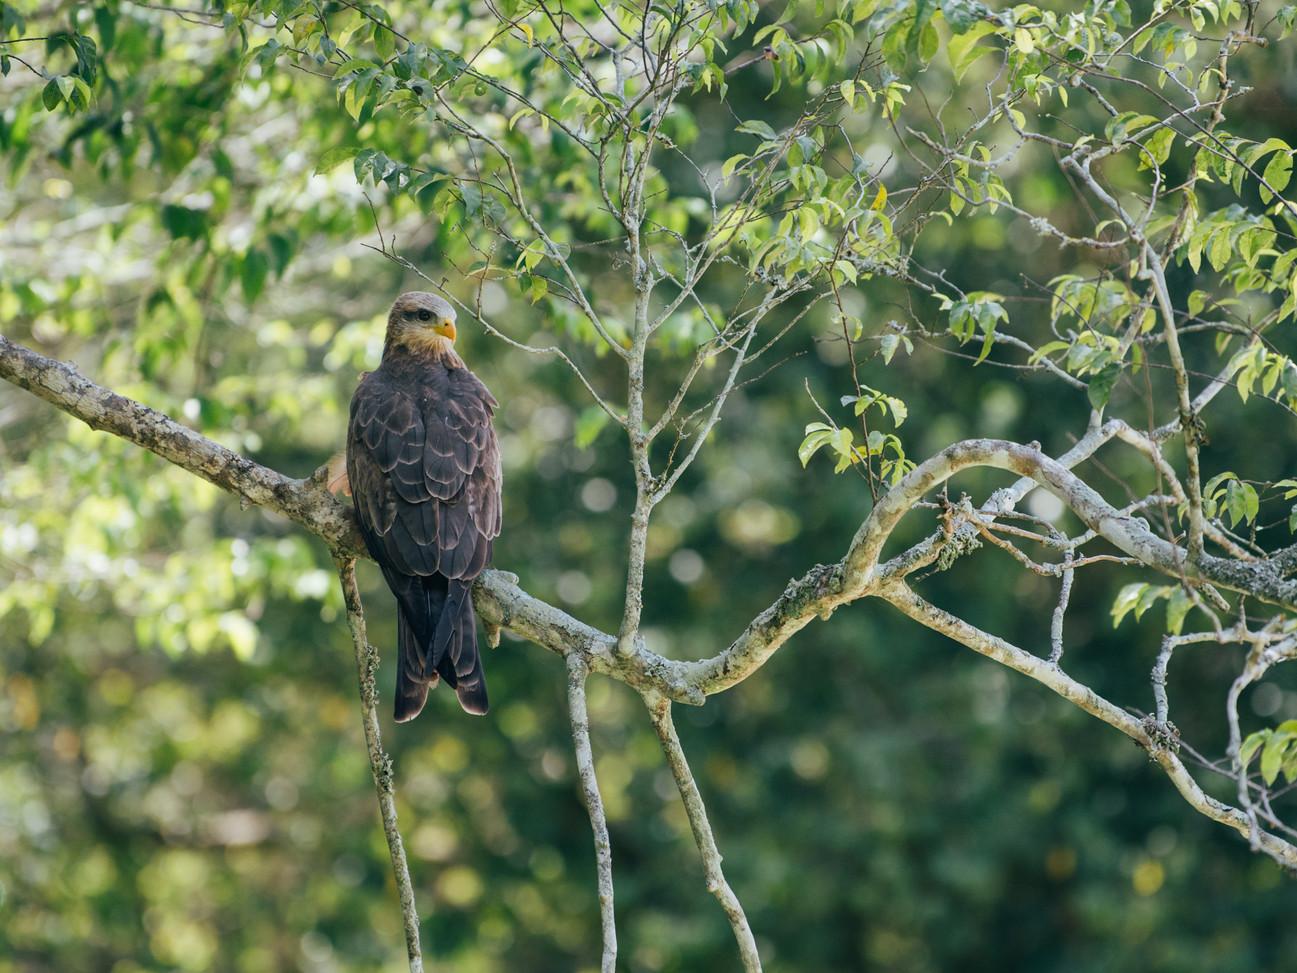 Kite in Rubondo Island Chimp Camp Tanzania